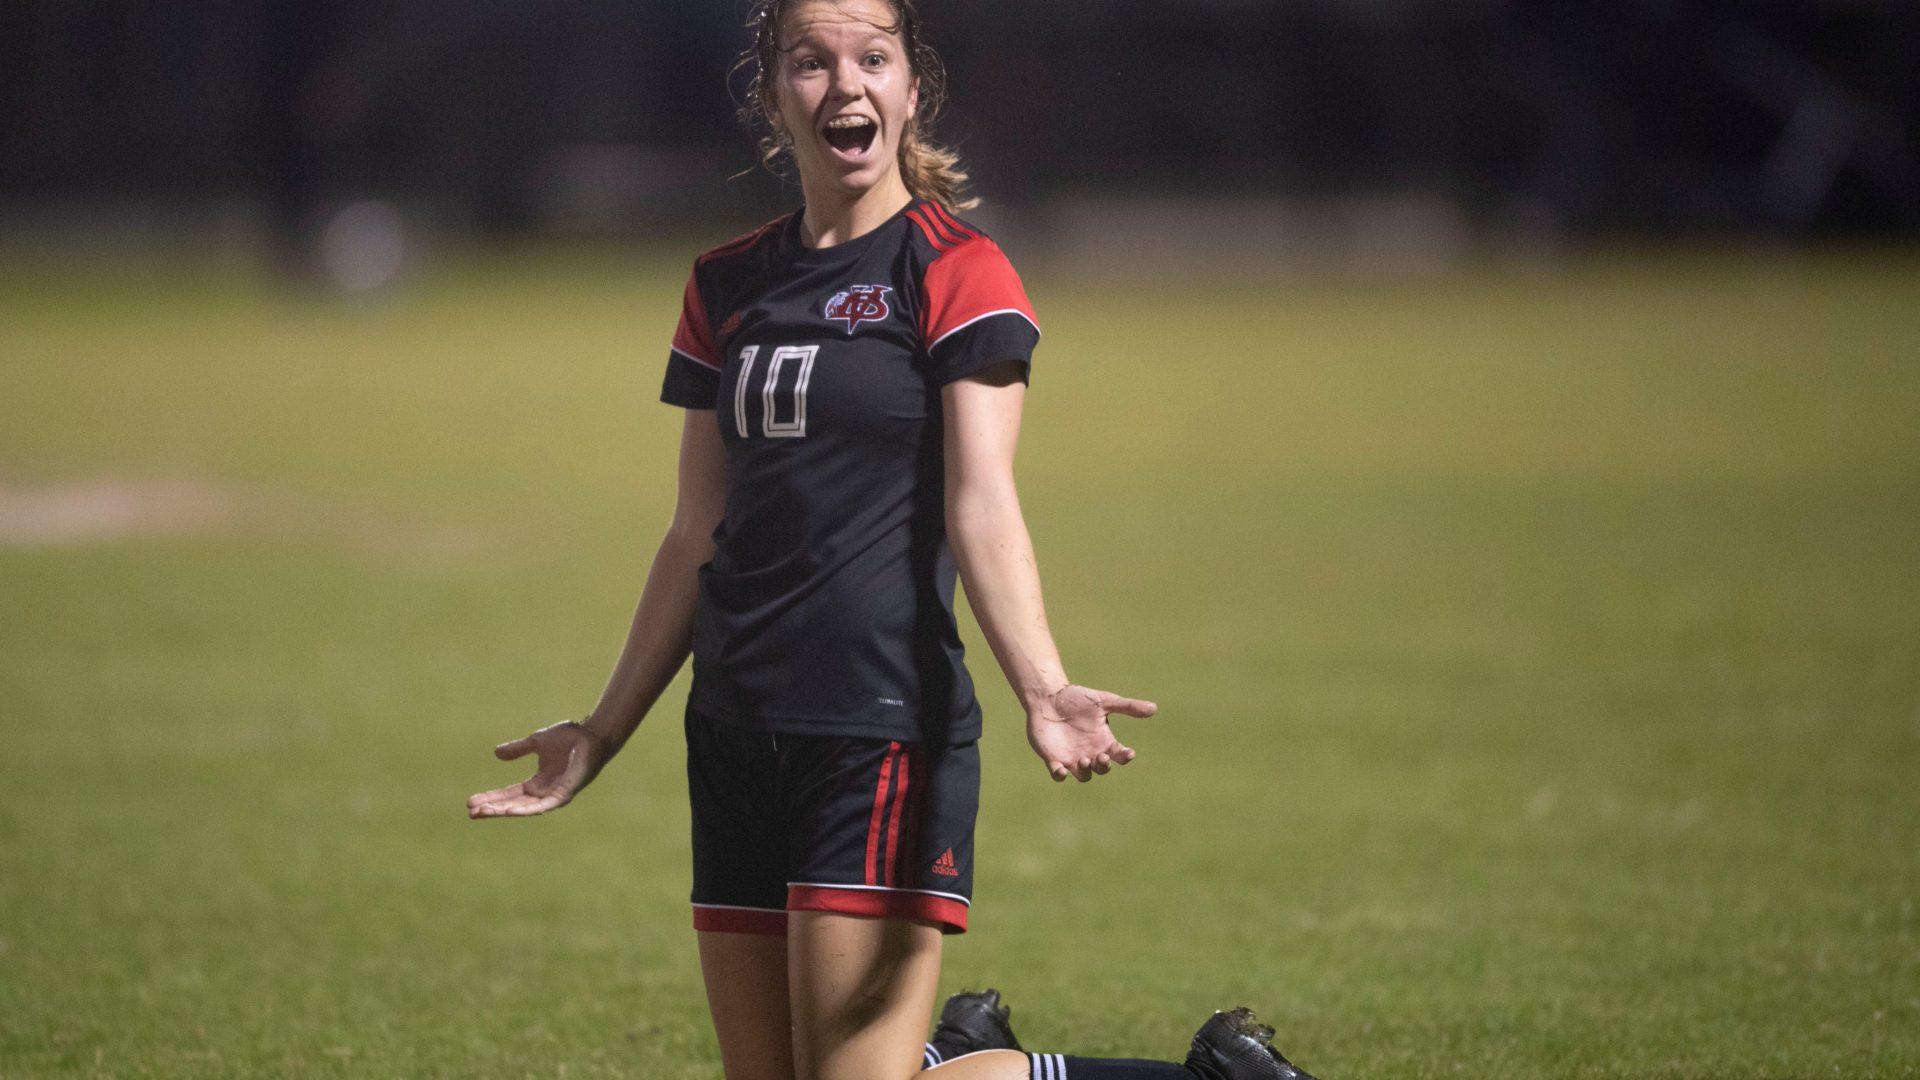 Vero Beach forward named Miss Soccer